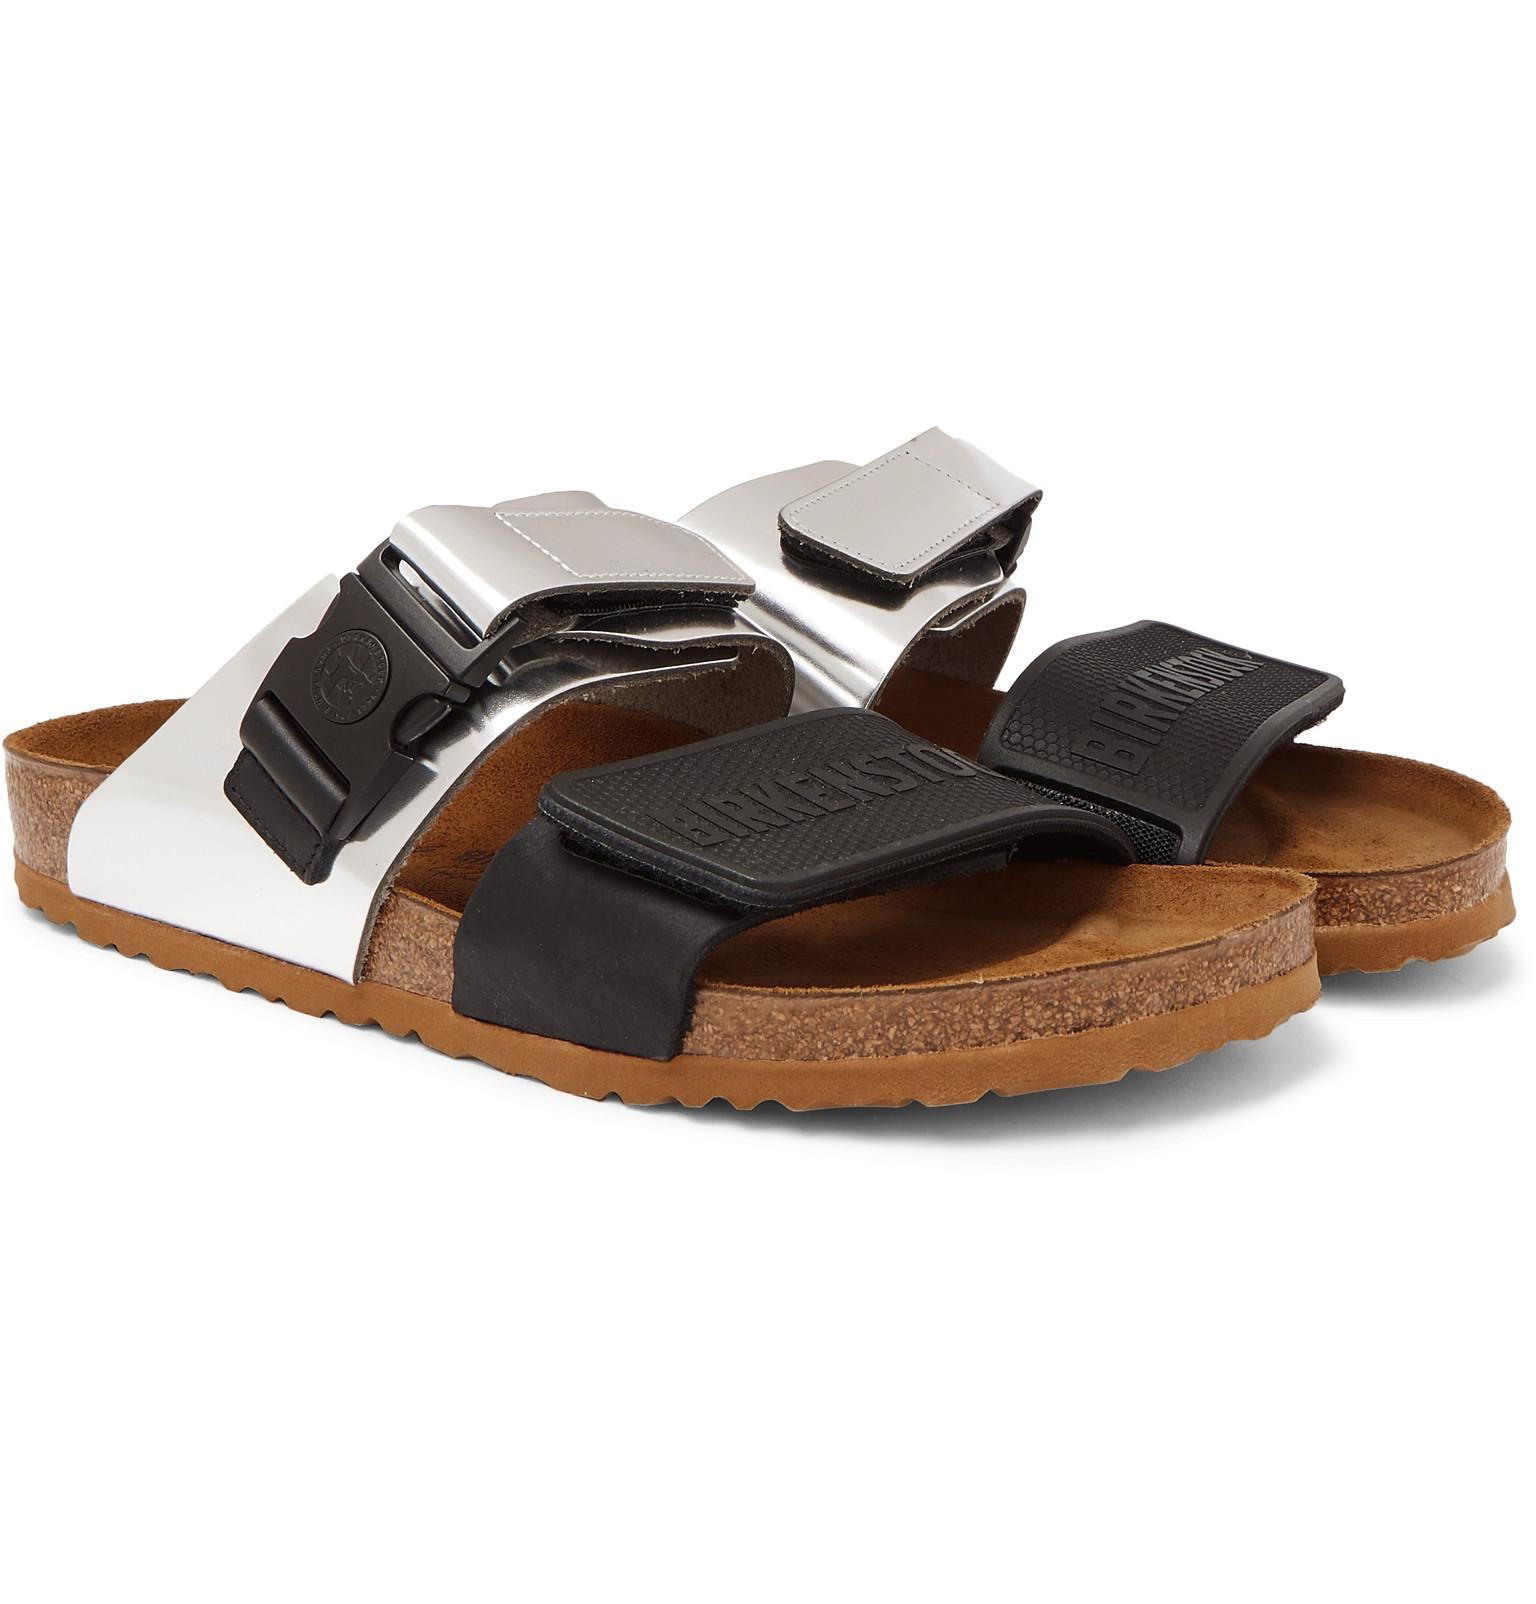 10f241b1949a Rick Owens. Men s + Birkenstock Rotterdam Metallic Leather And Rubber  Sandals